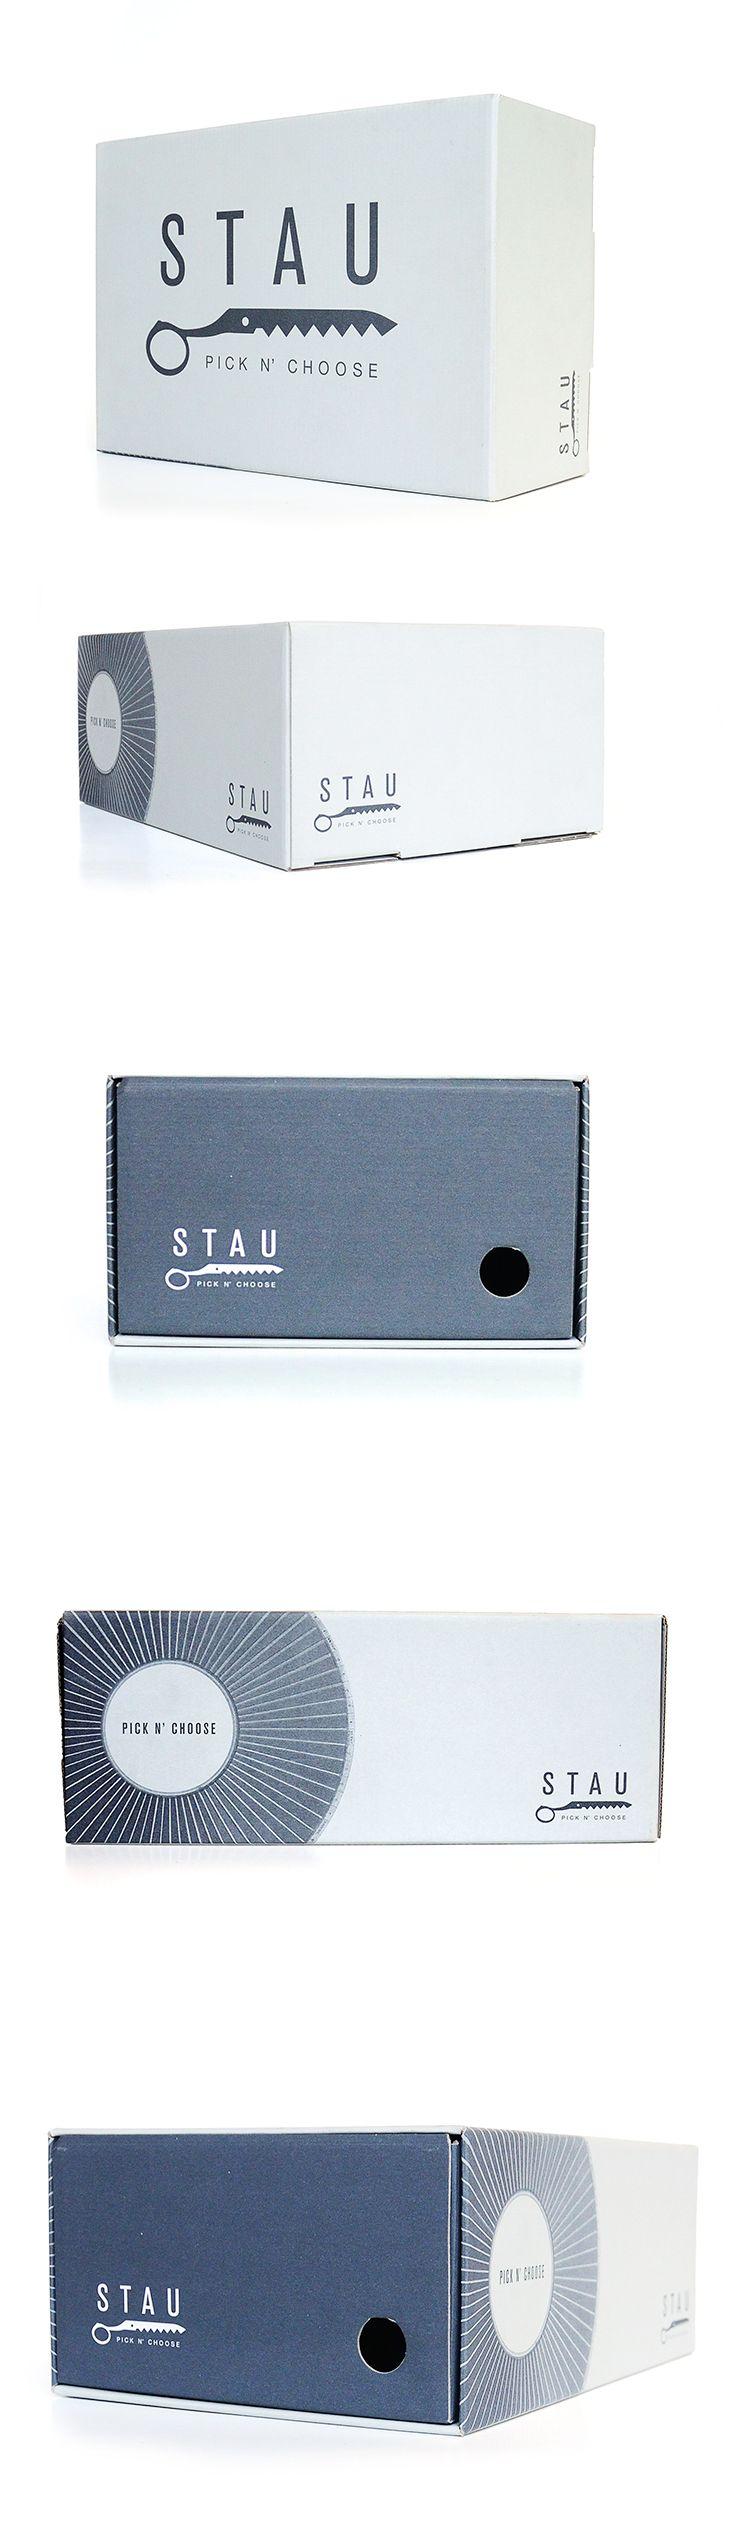 Scatola da scarpe Stau, un progetto #effADV - Stau shoe box, effADV project - #packaging #shoes #box